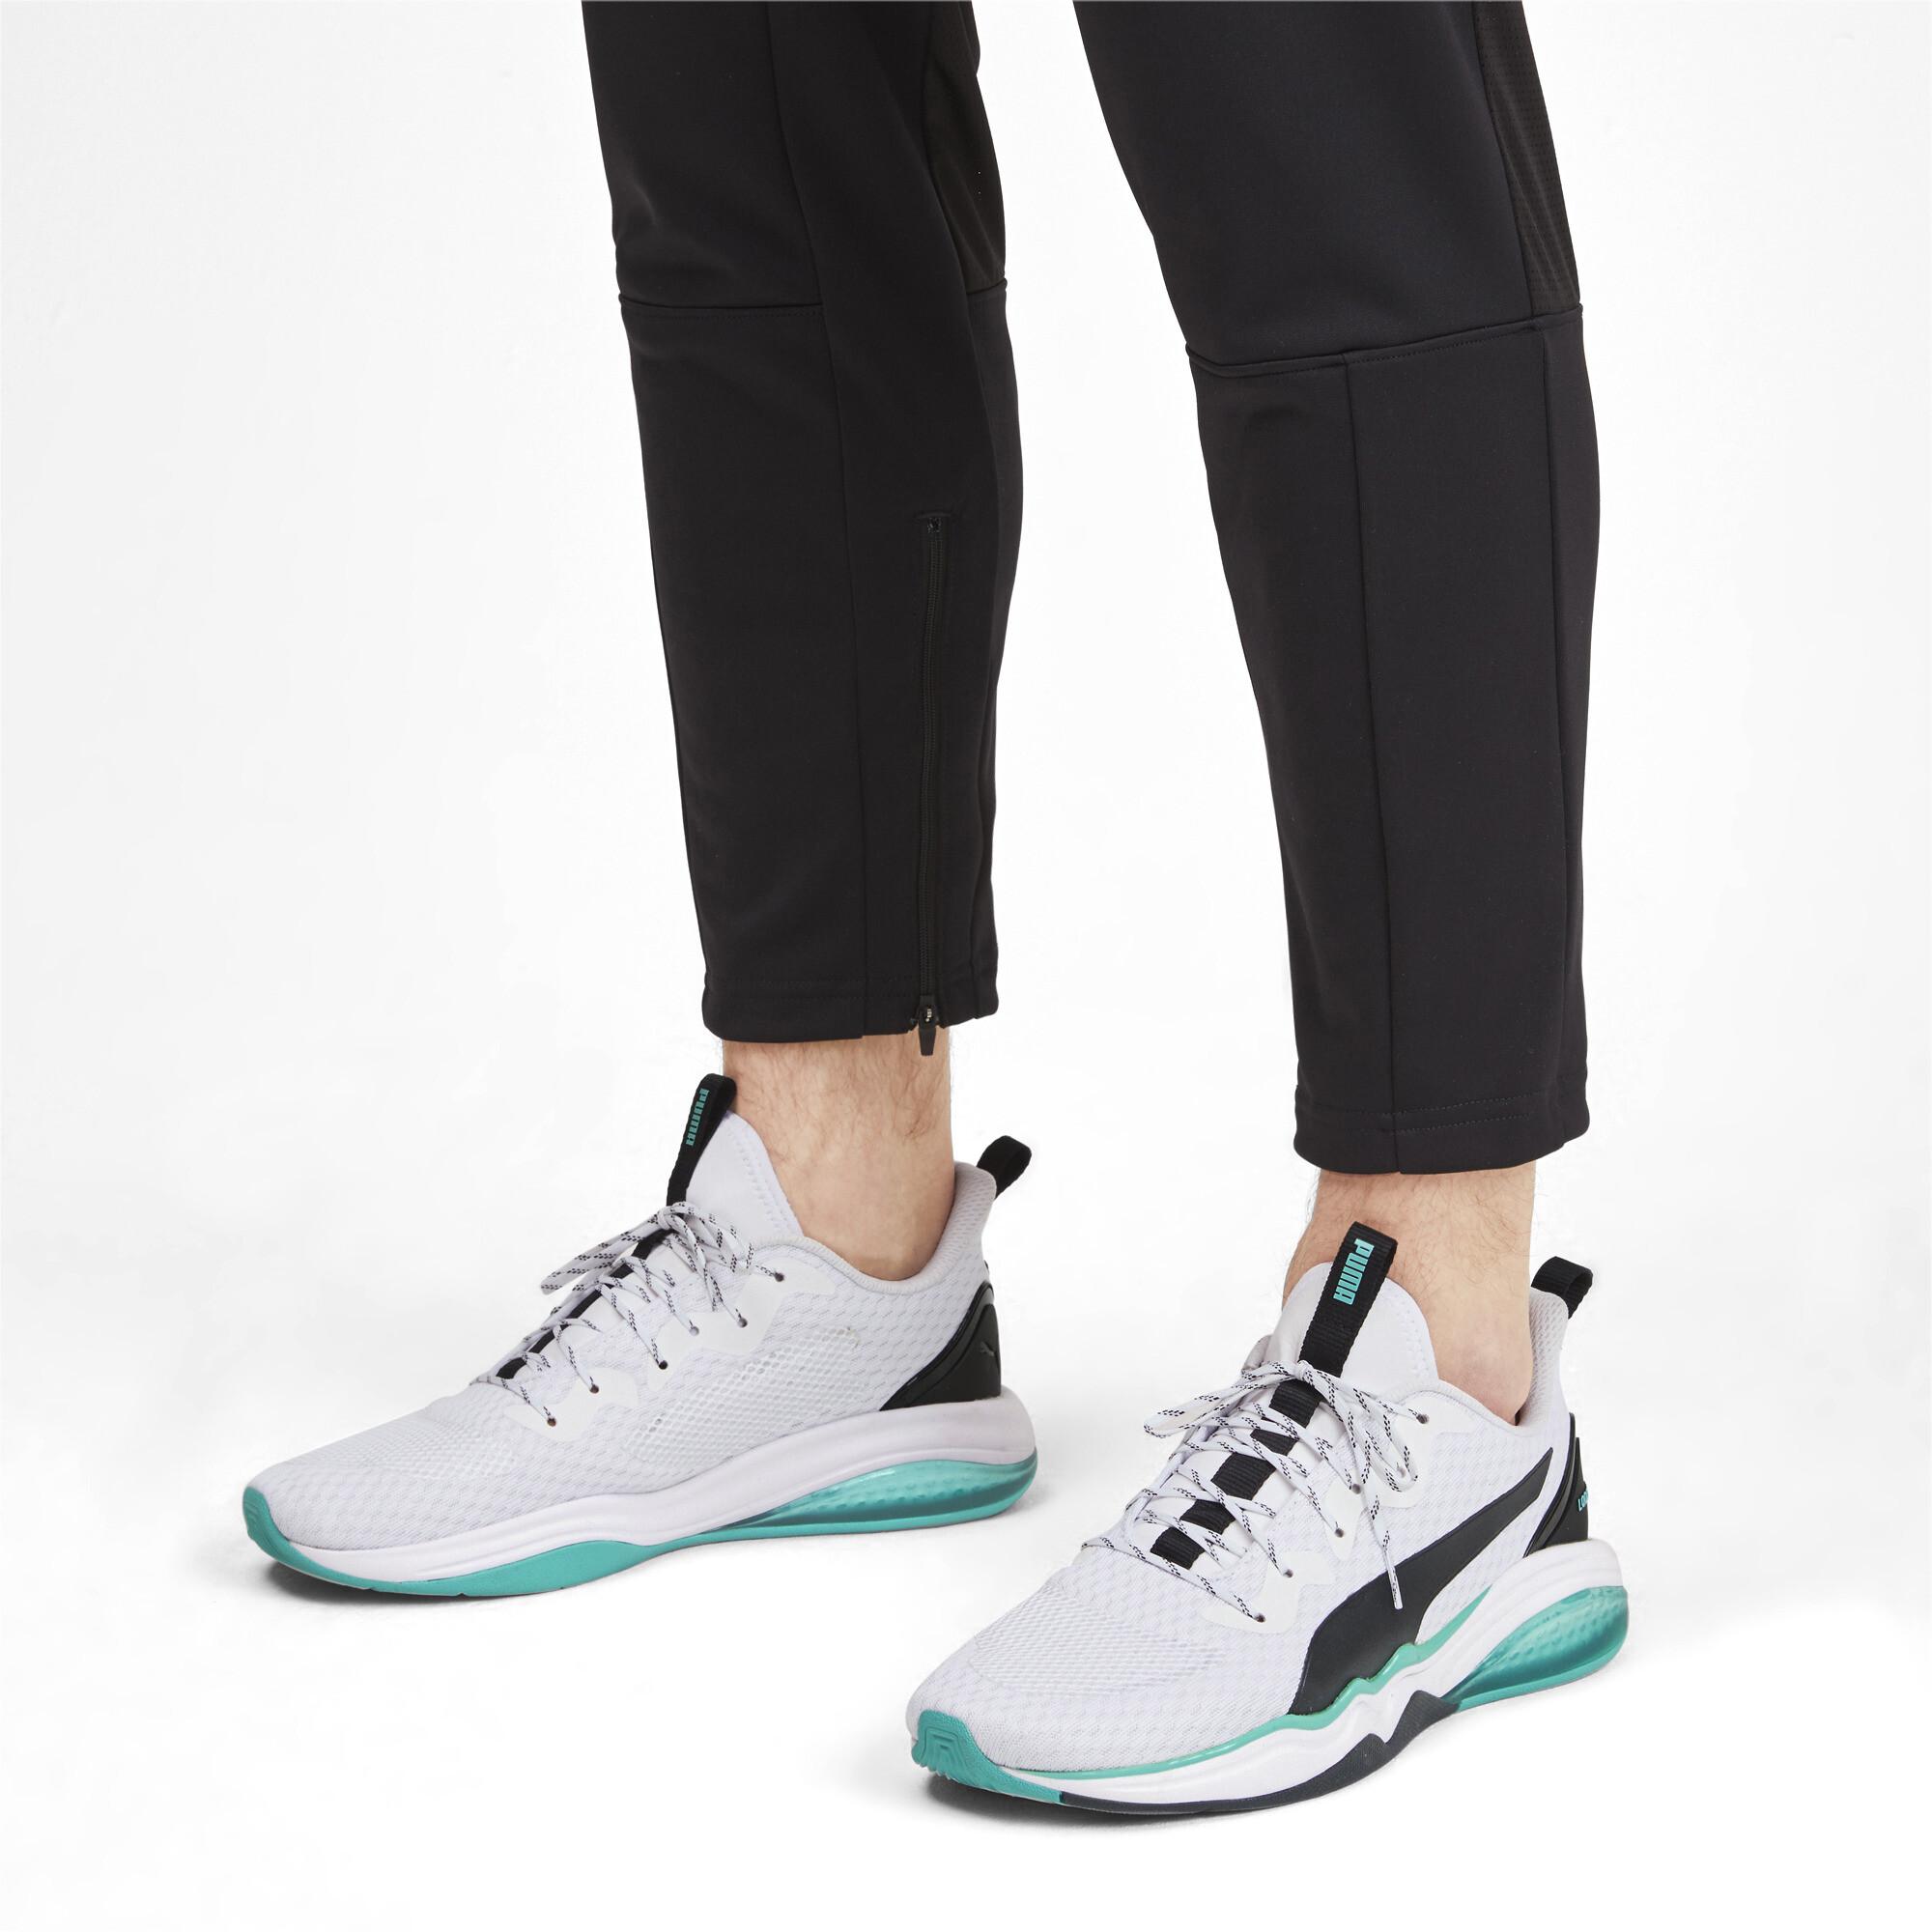 PUMA-LQDCELL-Tension-Men-039-s-Training-Shoes-Men-Shoe-Training thumbnail 5